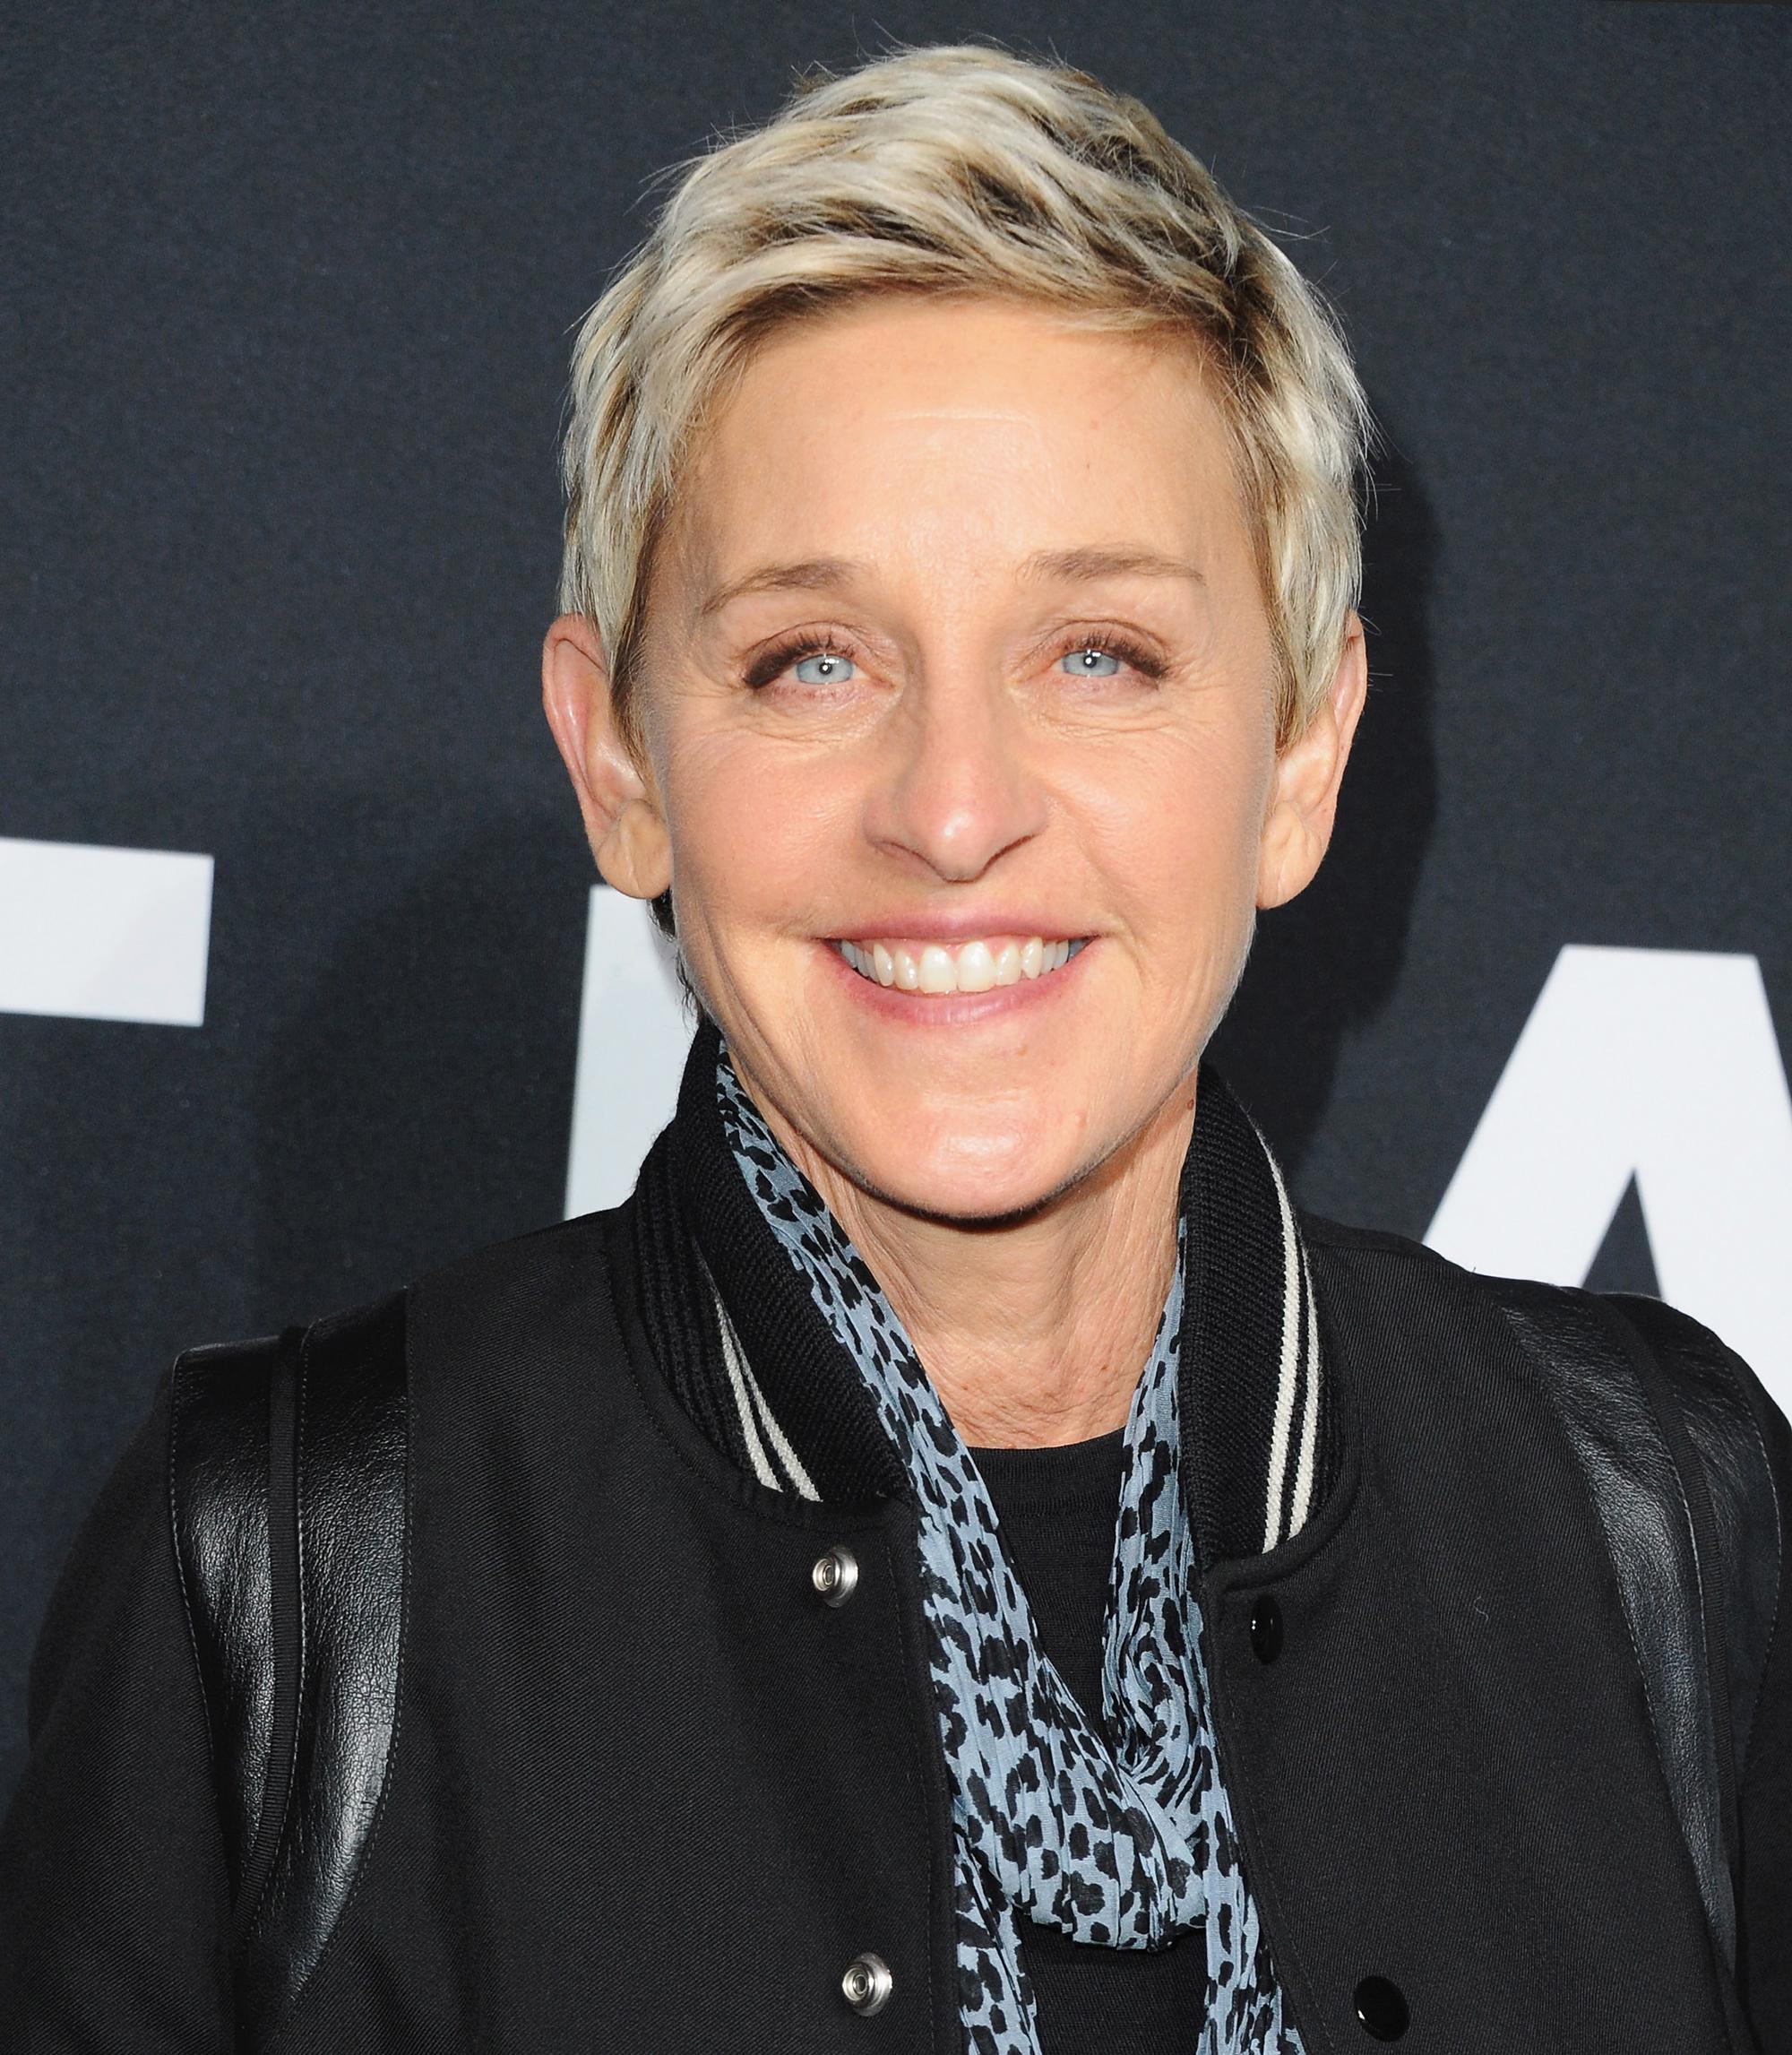 Ellen DeGeneres Producer Ellen The Ellen DeGeneres Show Emmywinning talk show host Ellen Lee DeGeneres was born in Metairie Louisiana a New Orleans suburb She